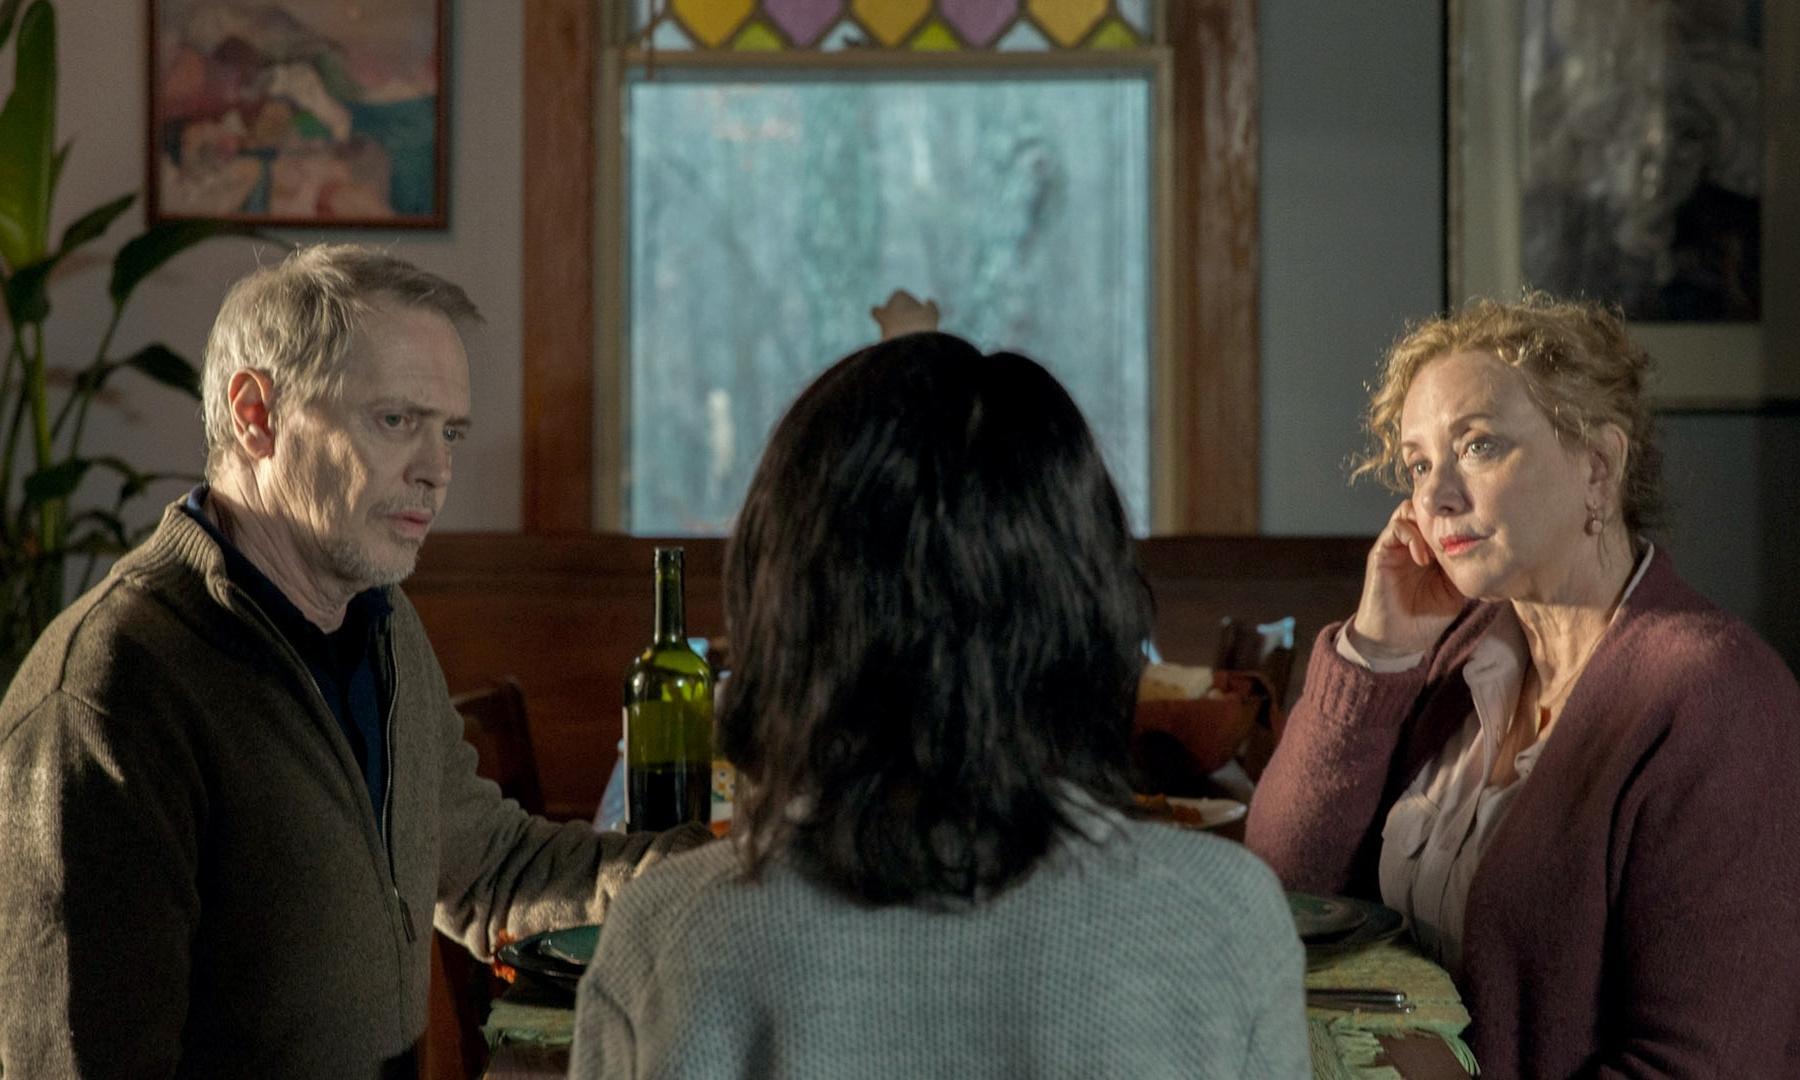 Nancy review – Riseborough shines in engaging psychodrama